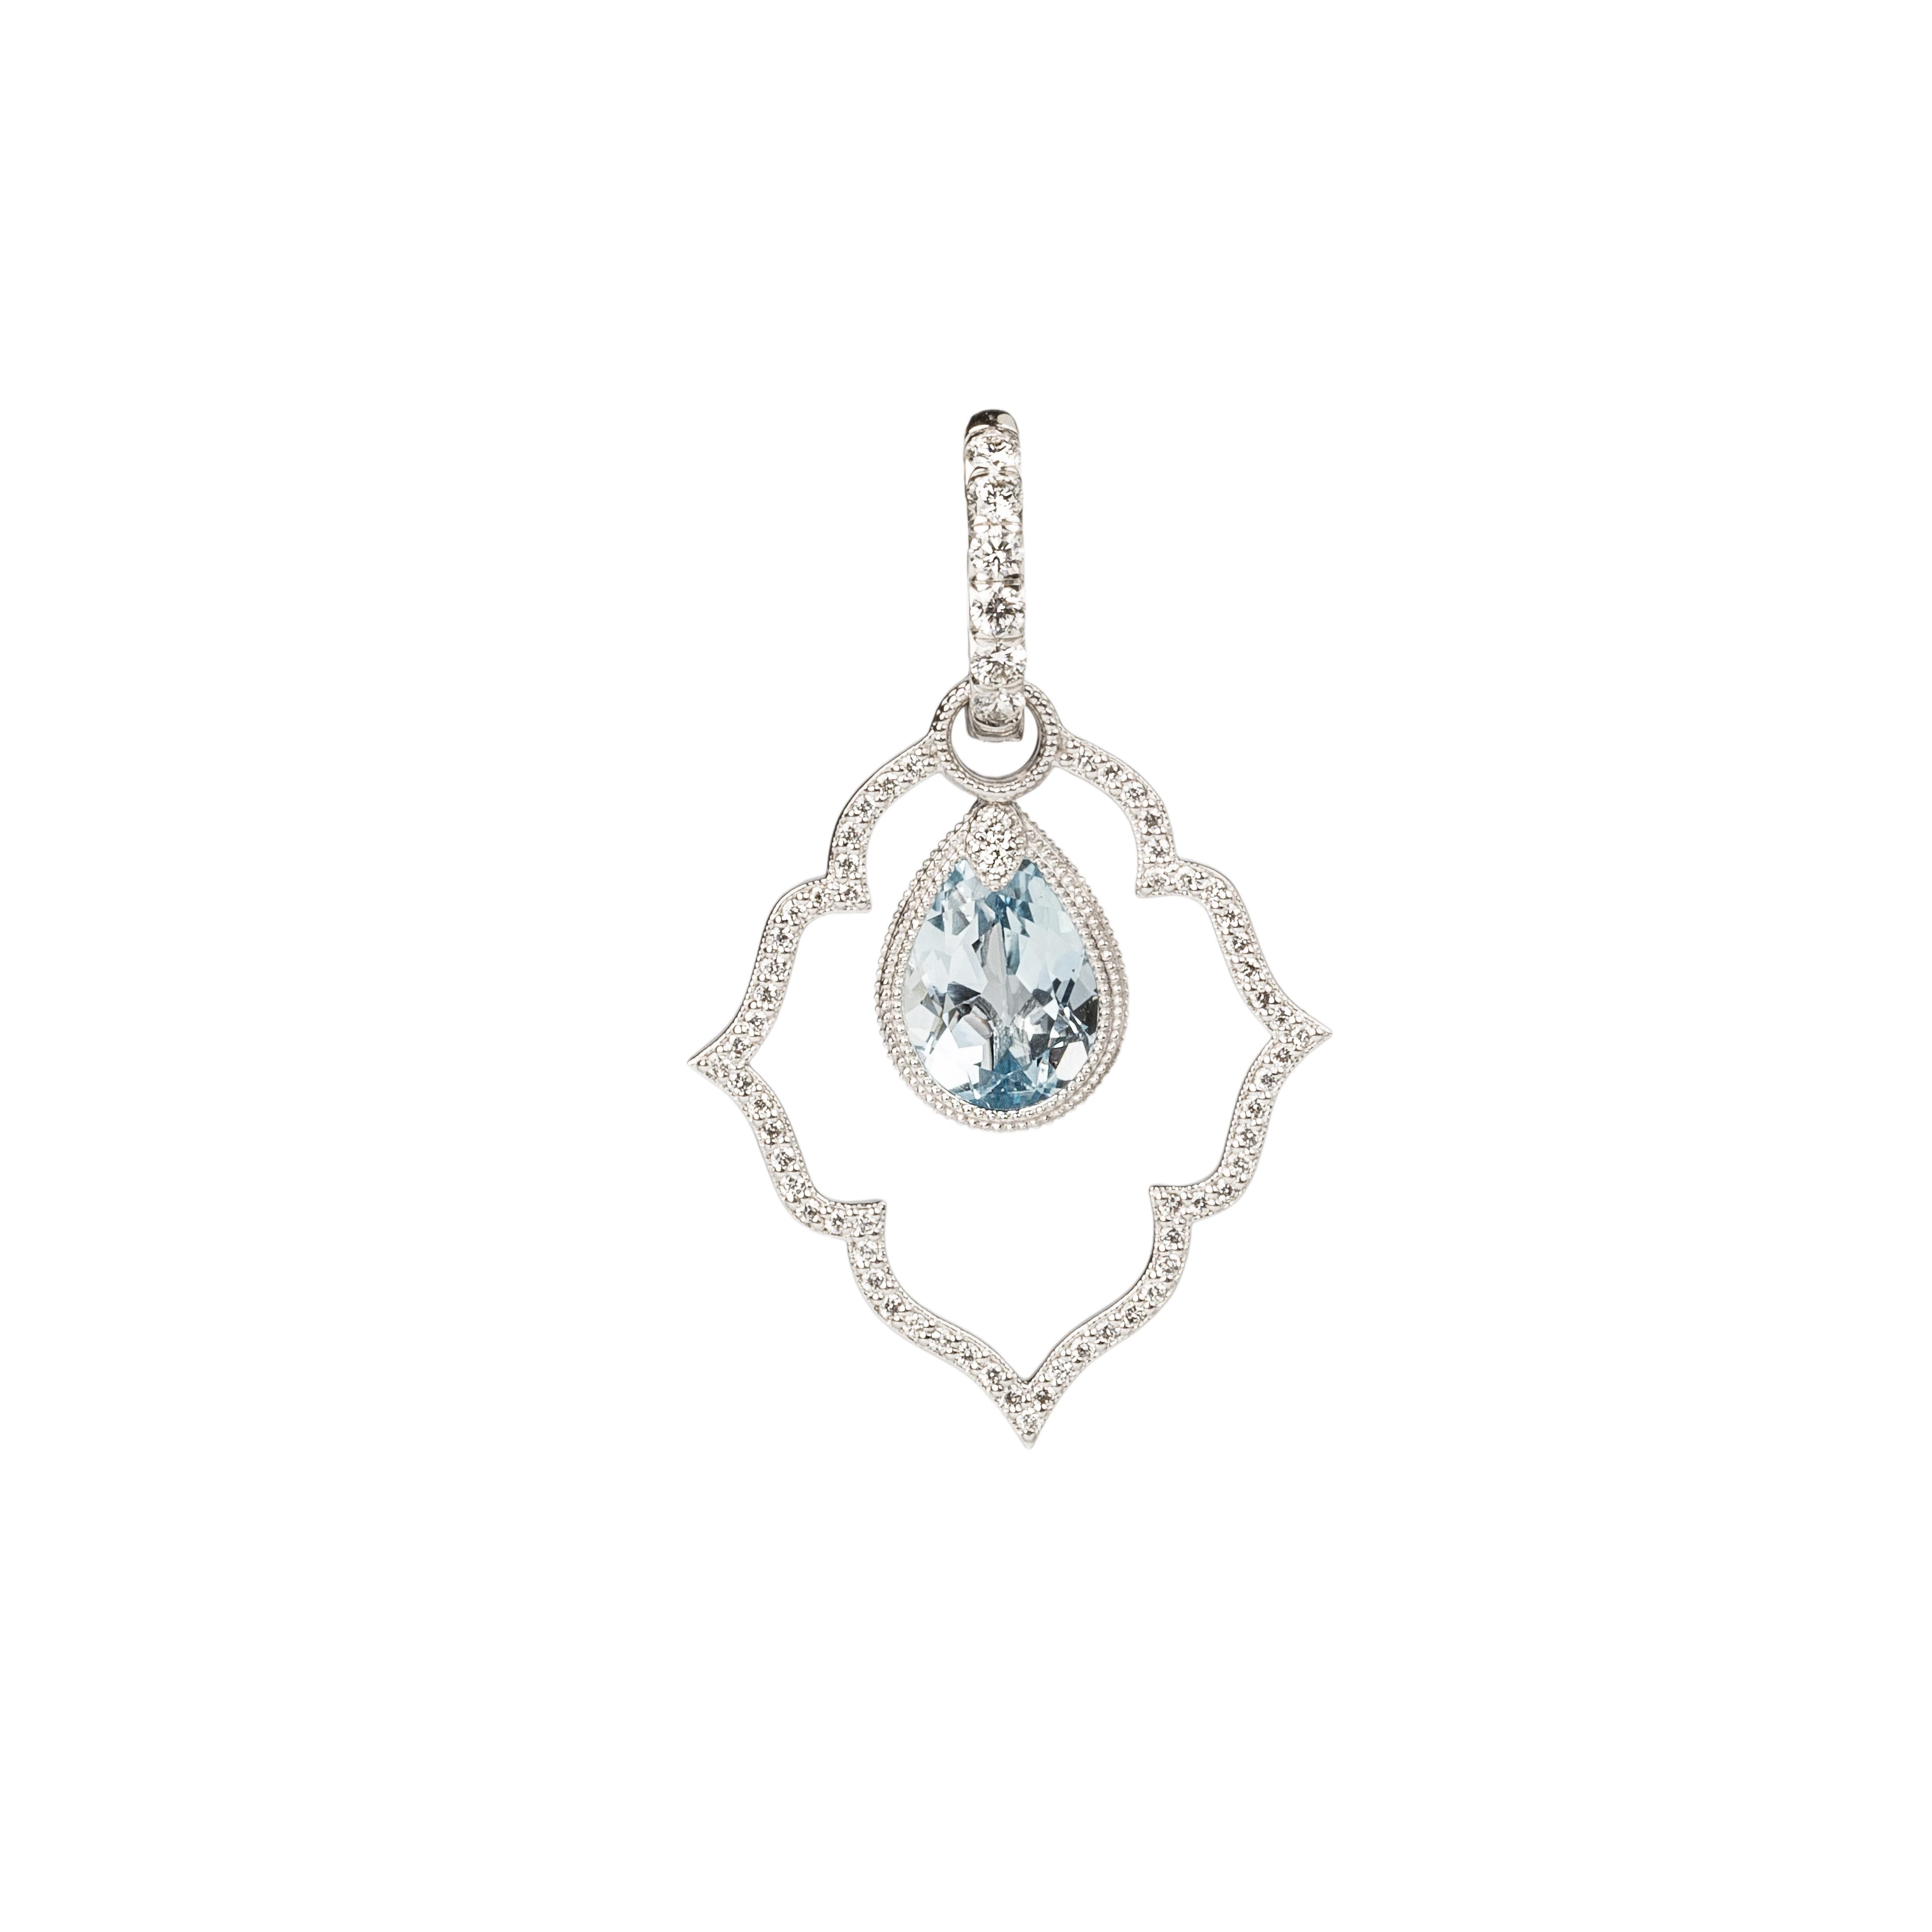 Jude Frances Blue Topaz Earrings Charms and Diamond Earring Charm Frames